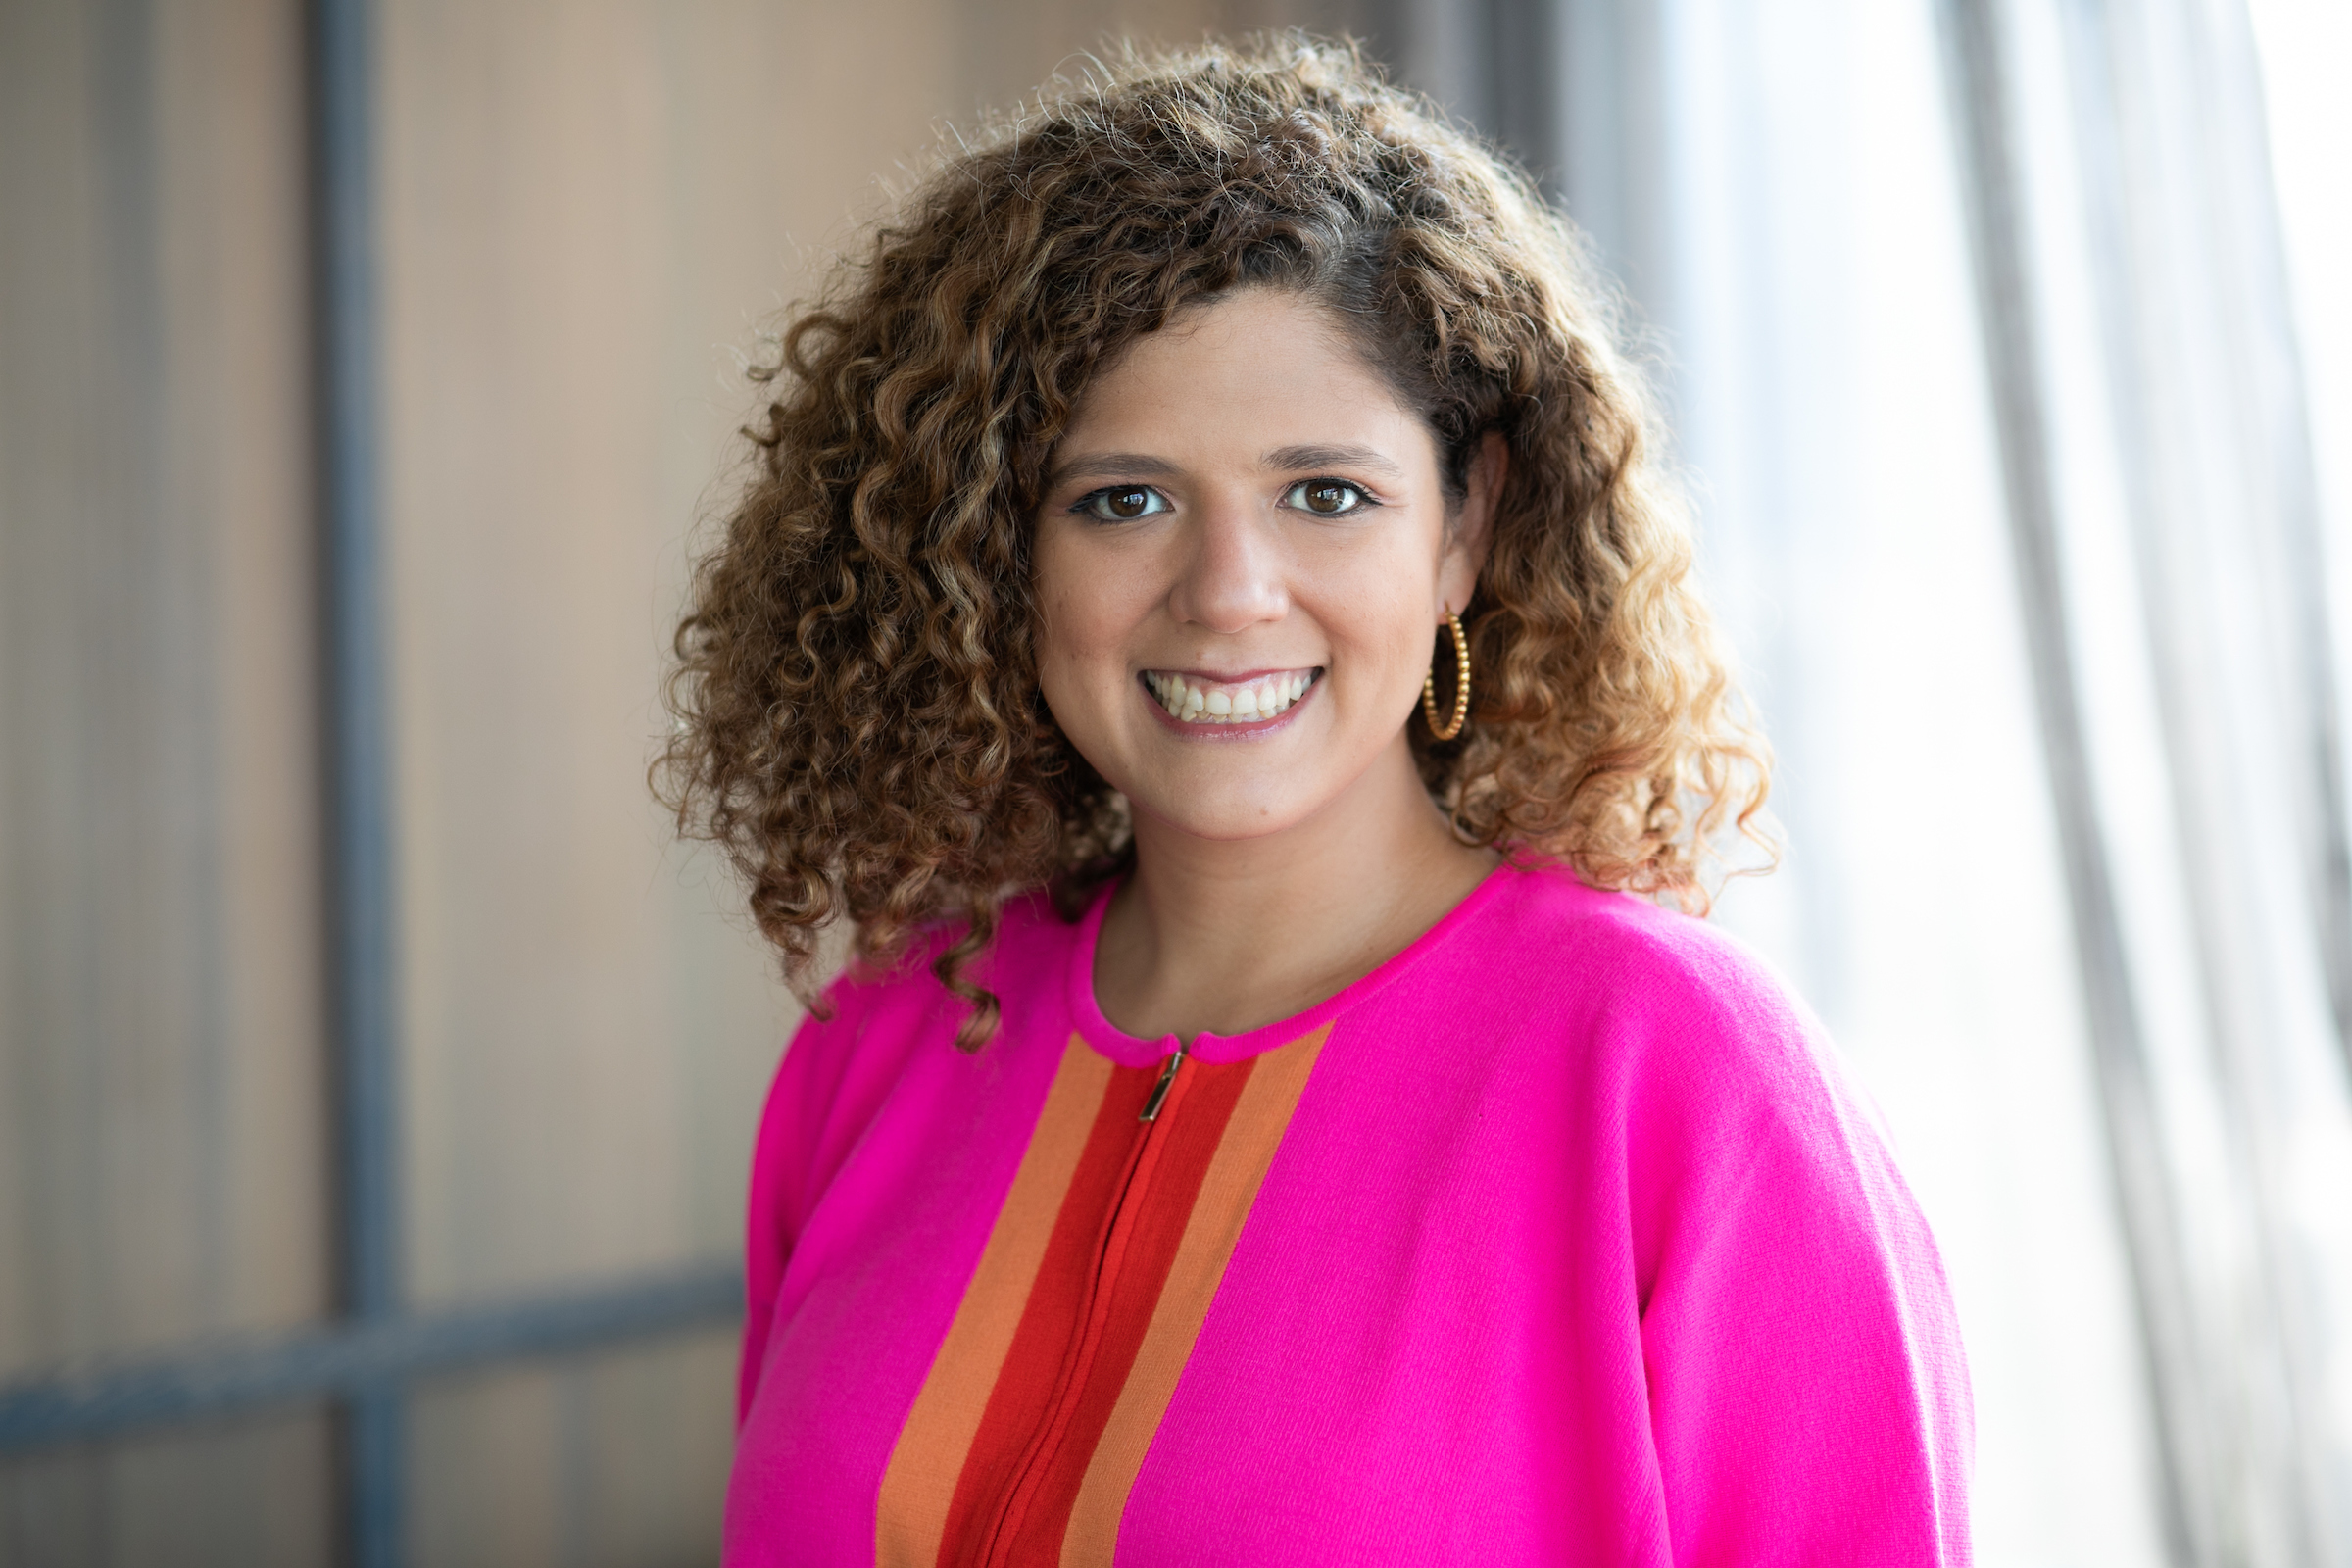 Maricella Herrera Avila